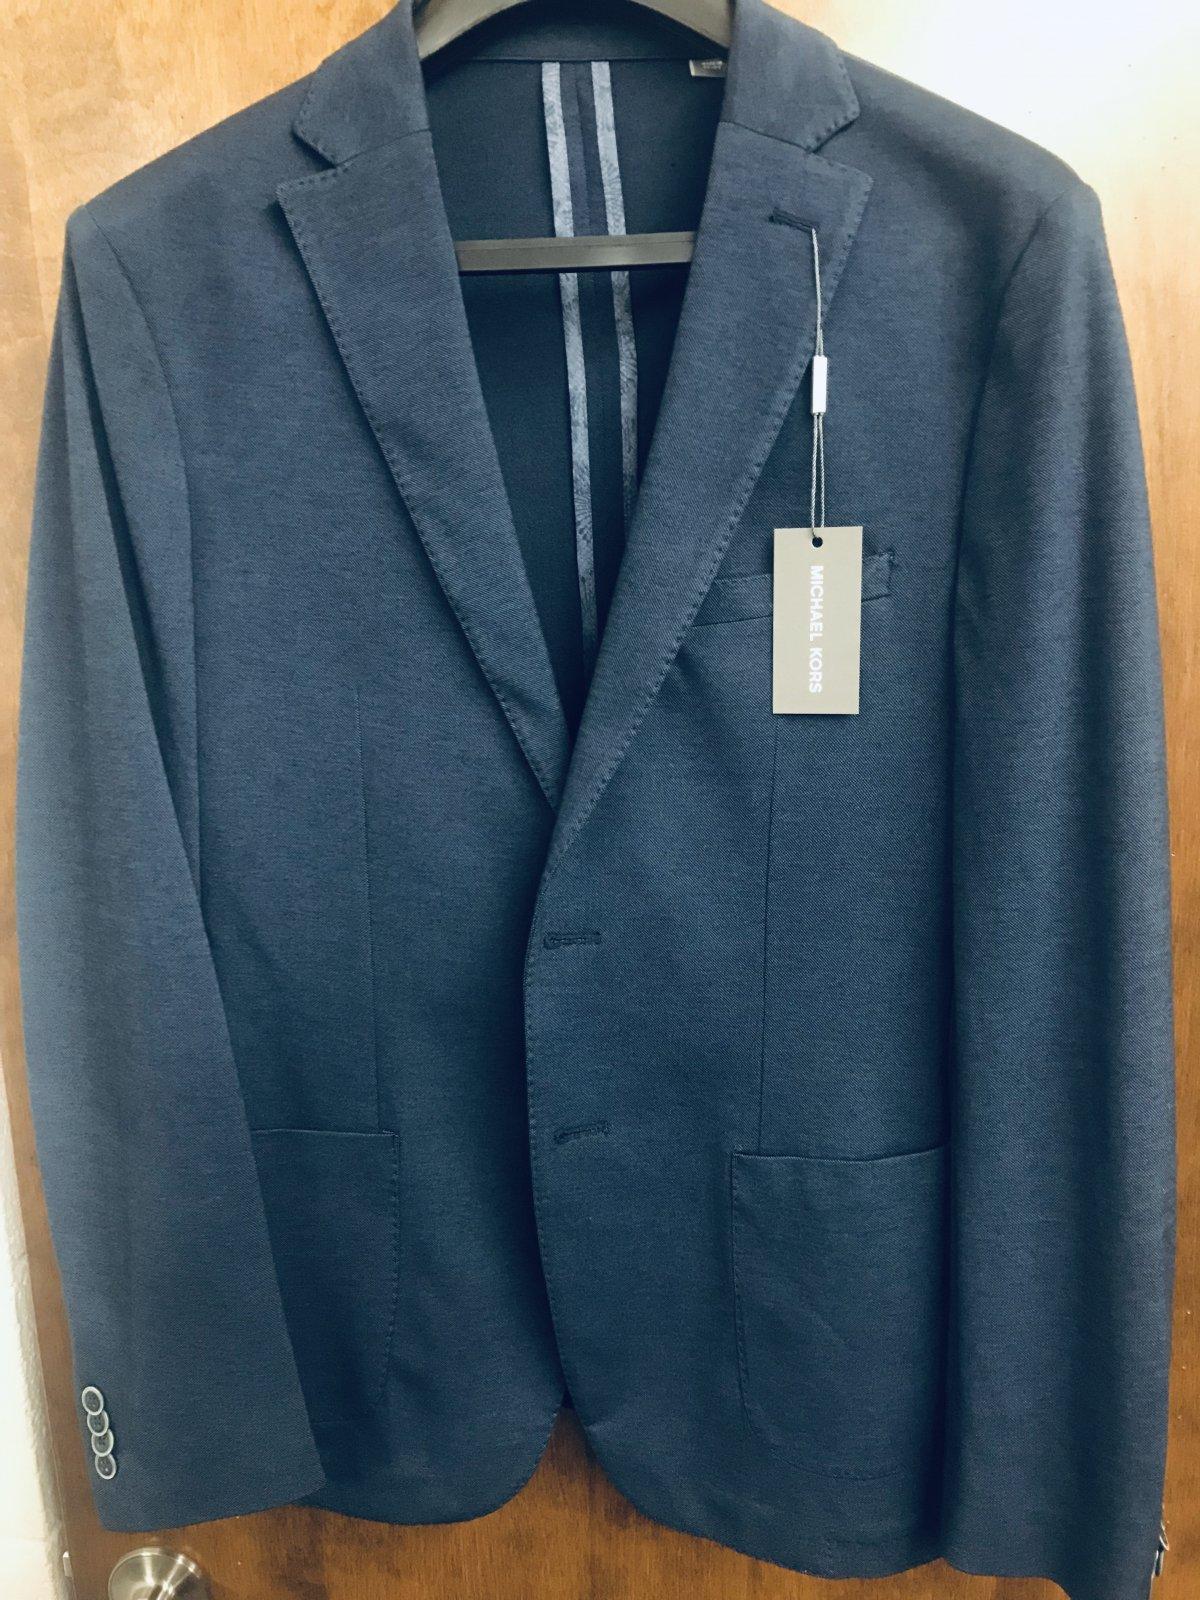 Michael Kors Soft Coat KVY004